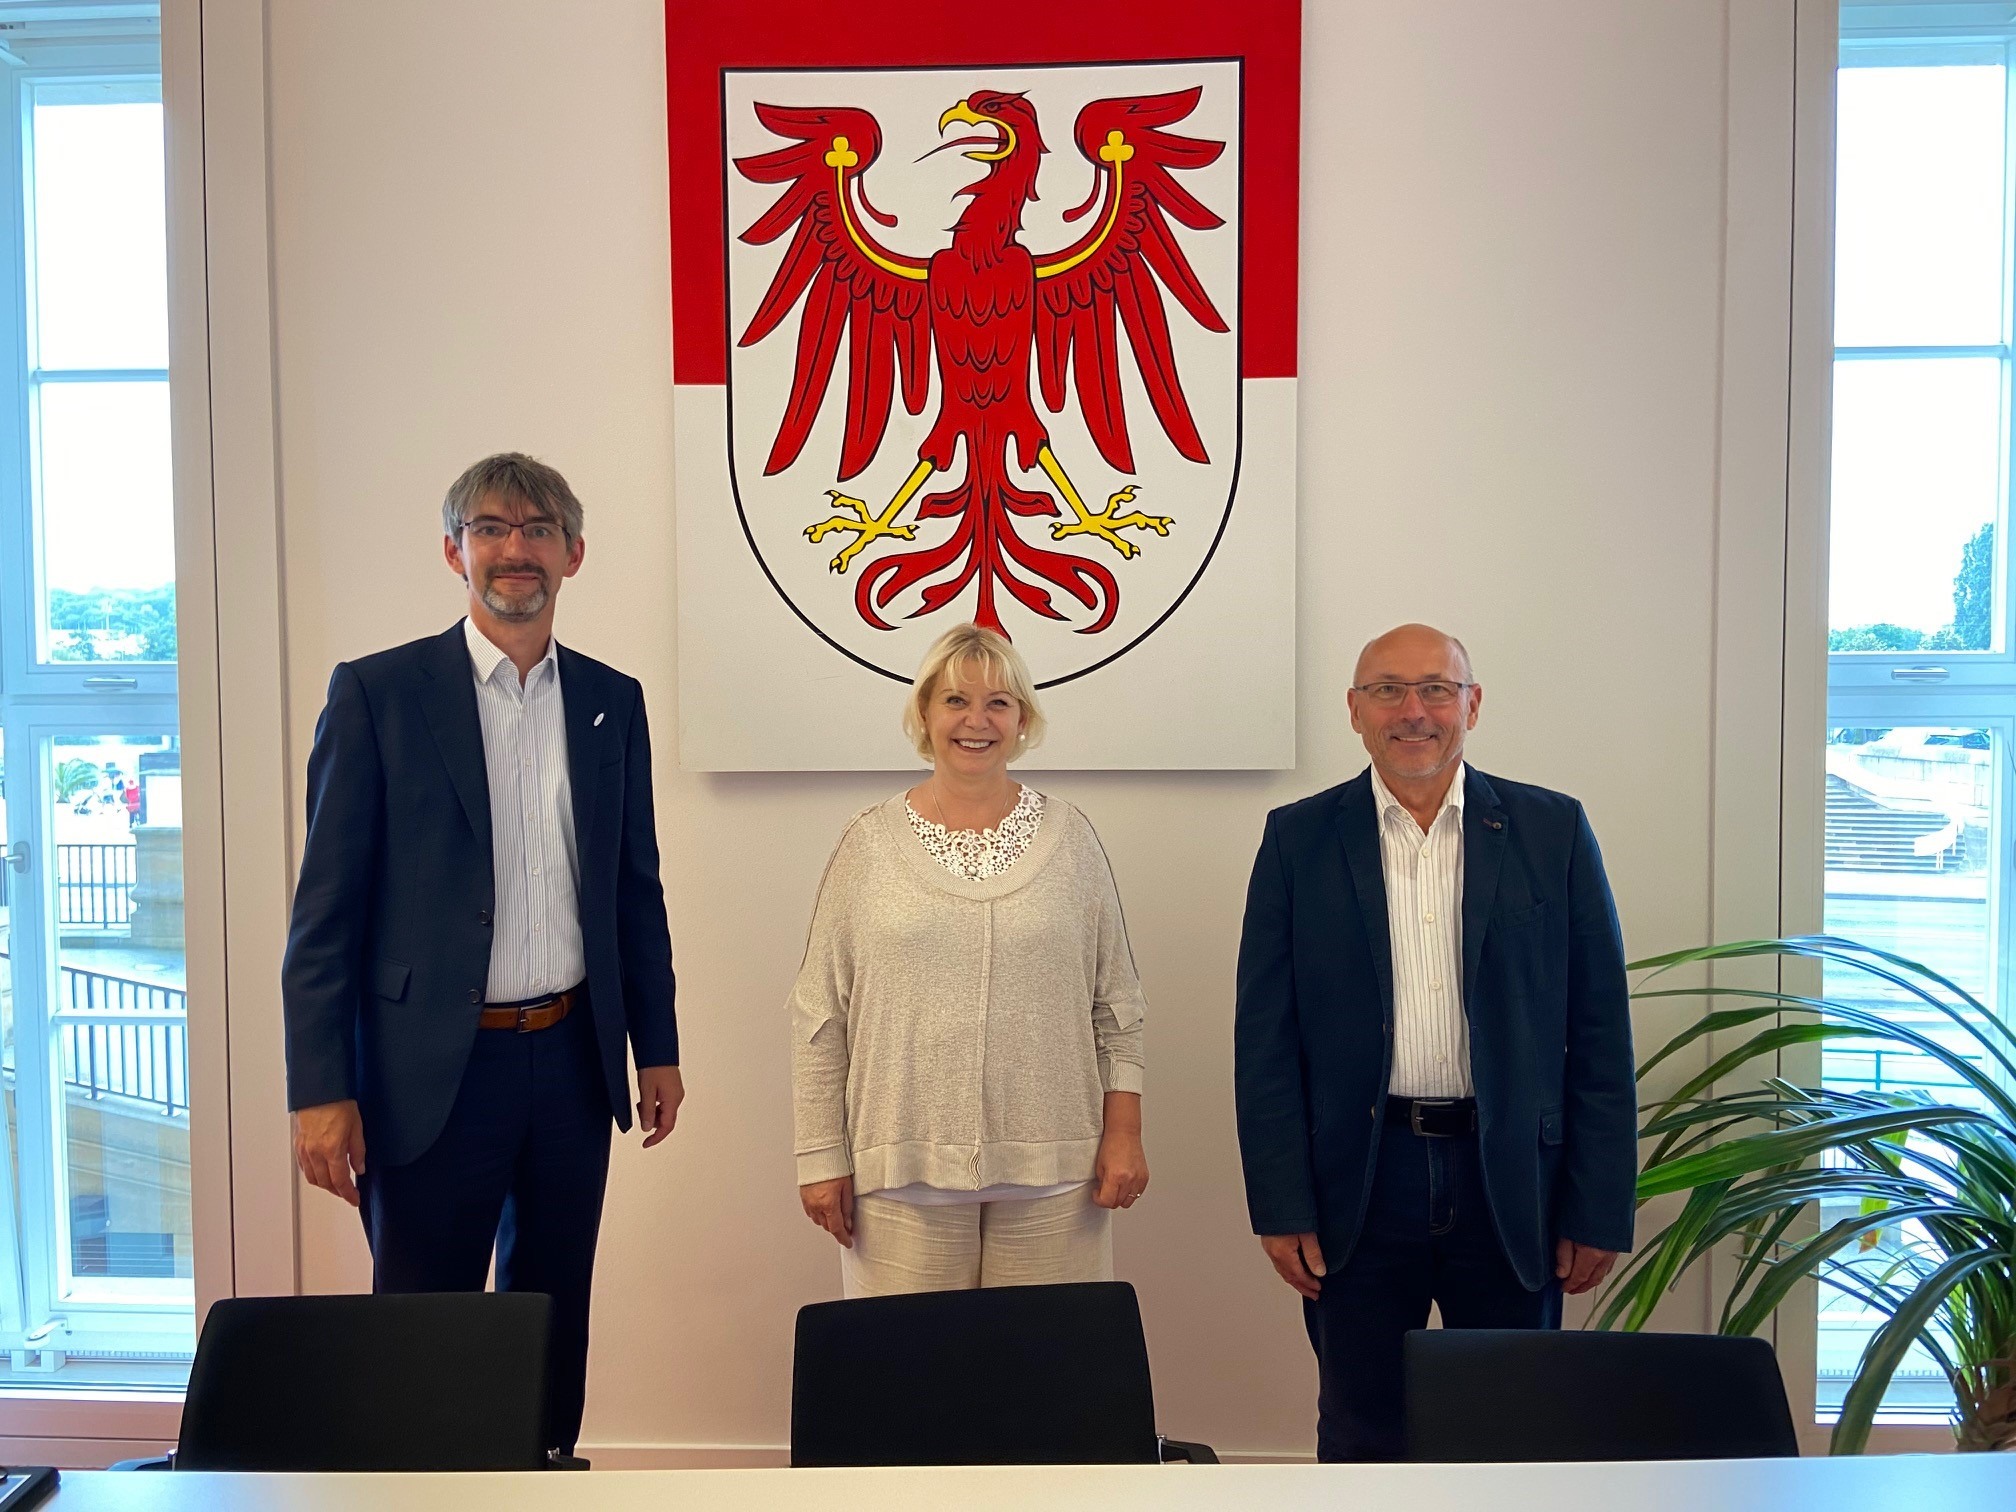 Landtagspräsidentin Prof. Dr. Liedtke übernimmt Schirmherrschaft des 1. Parlaments der Dörfer in 2021